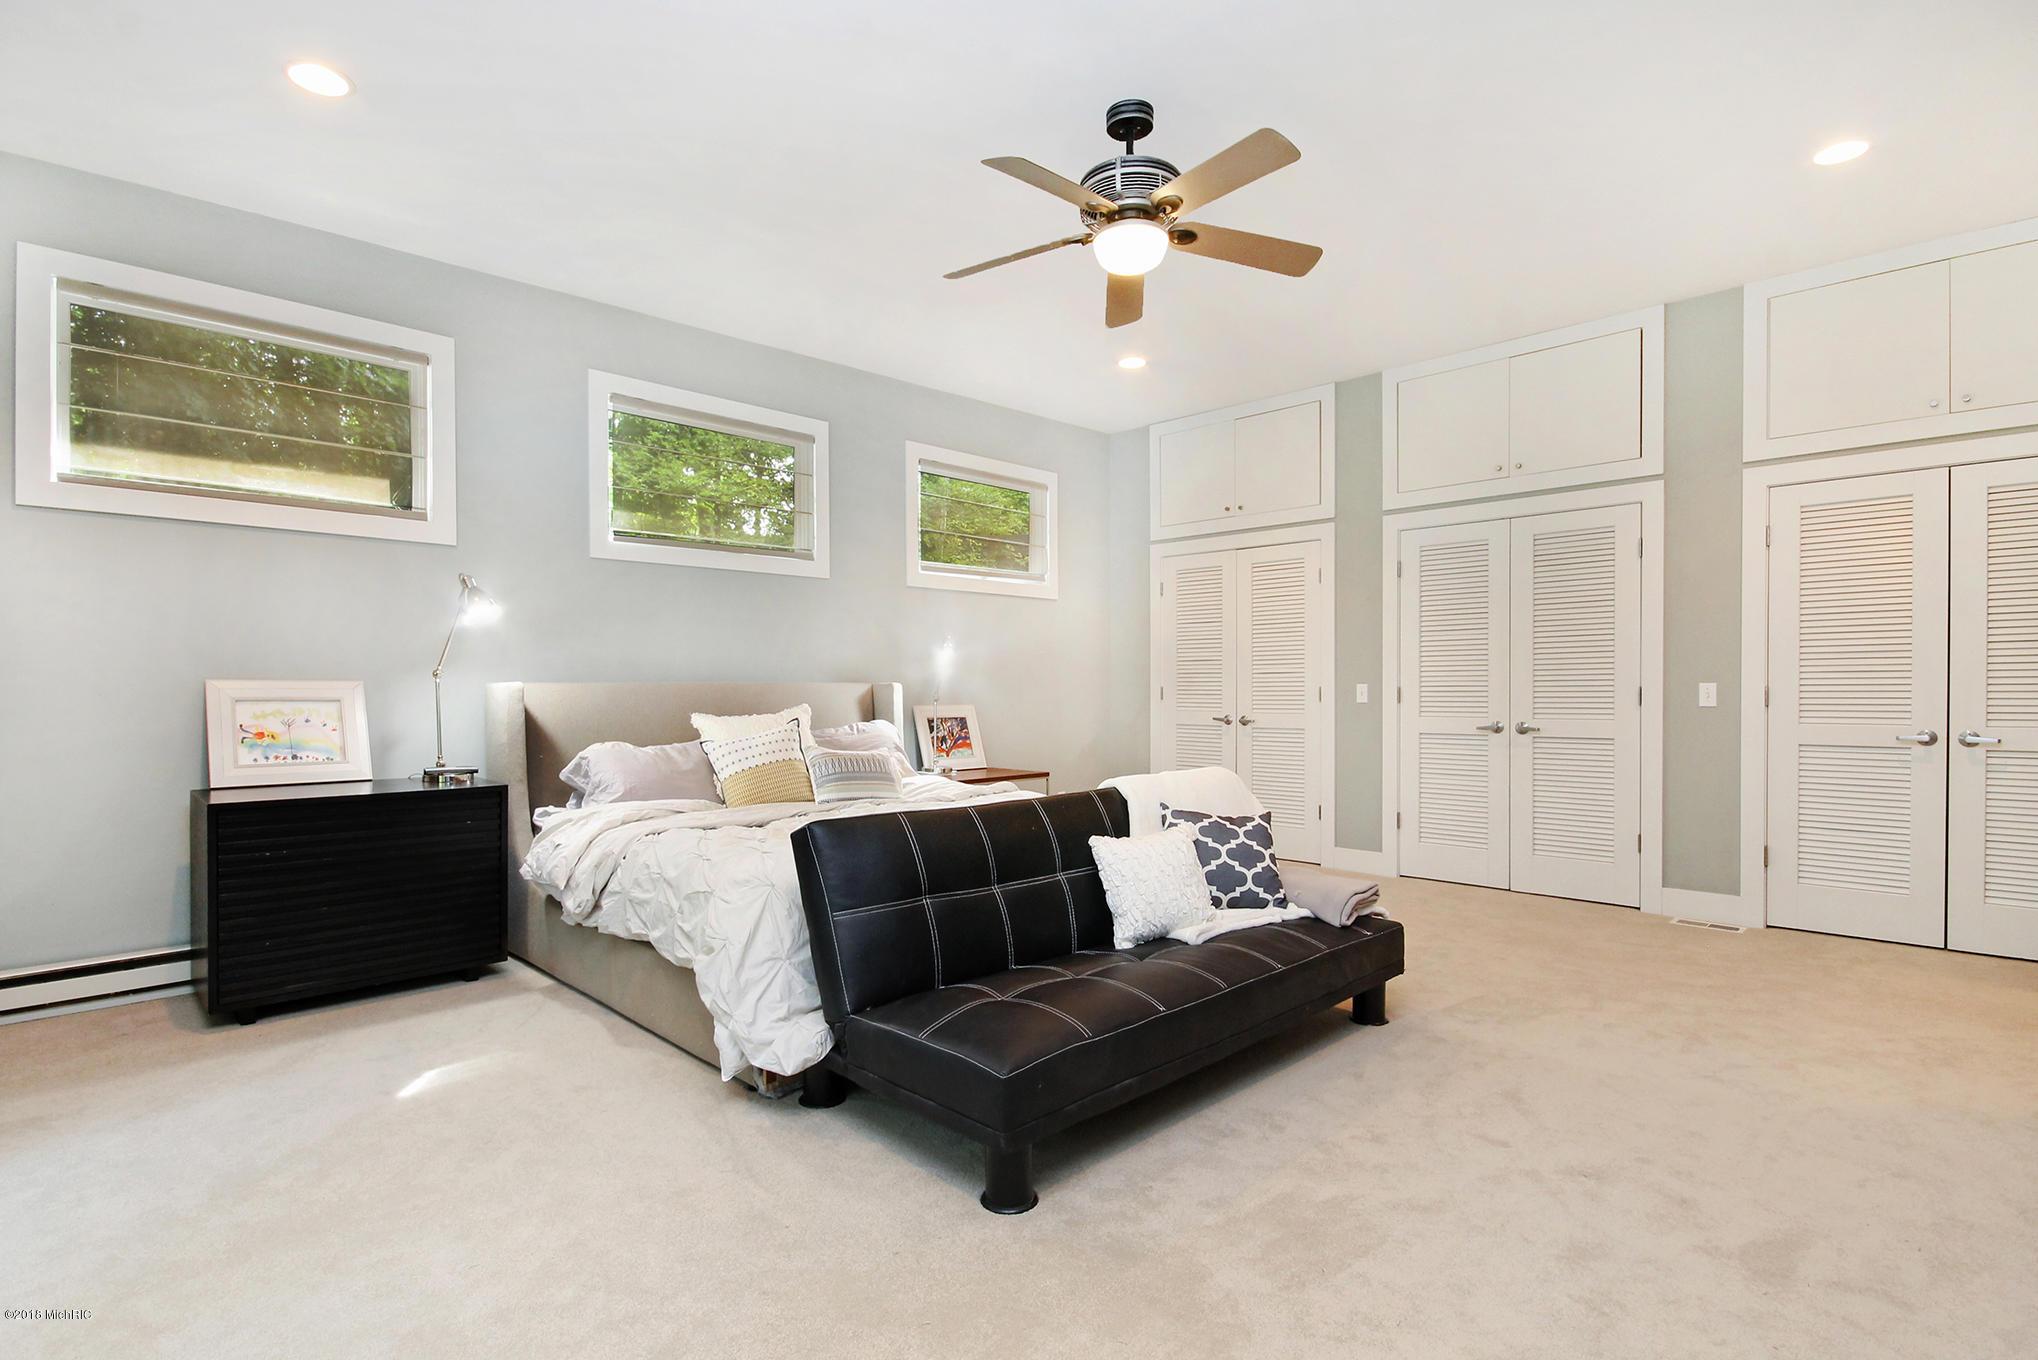 12new-bedroom1.jpg